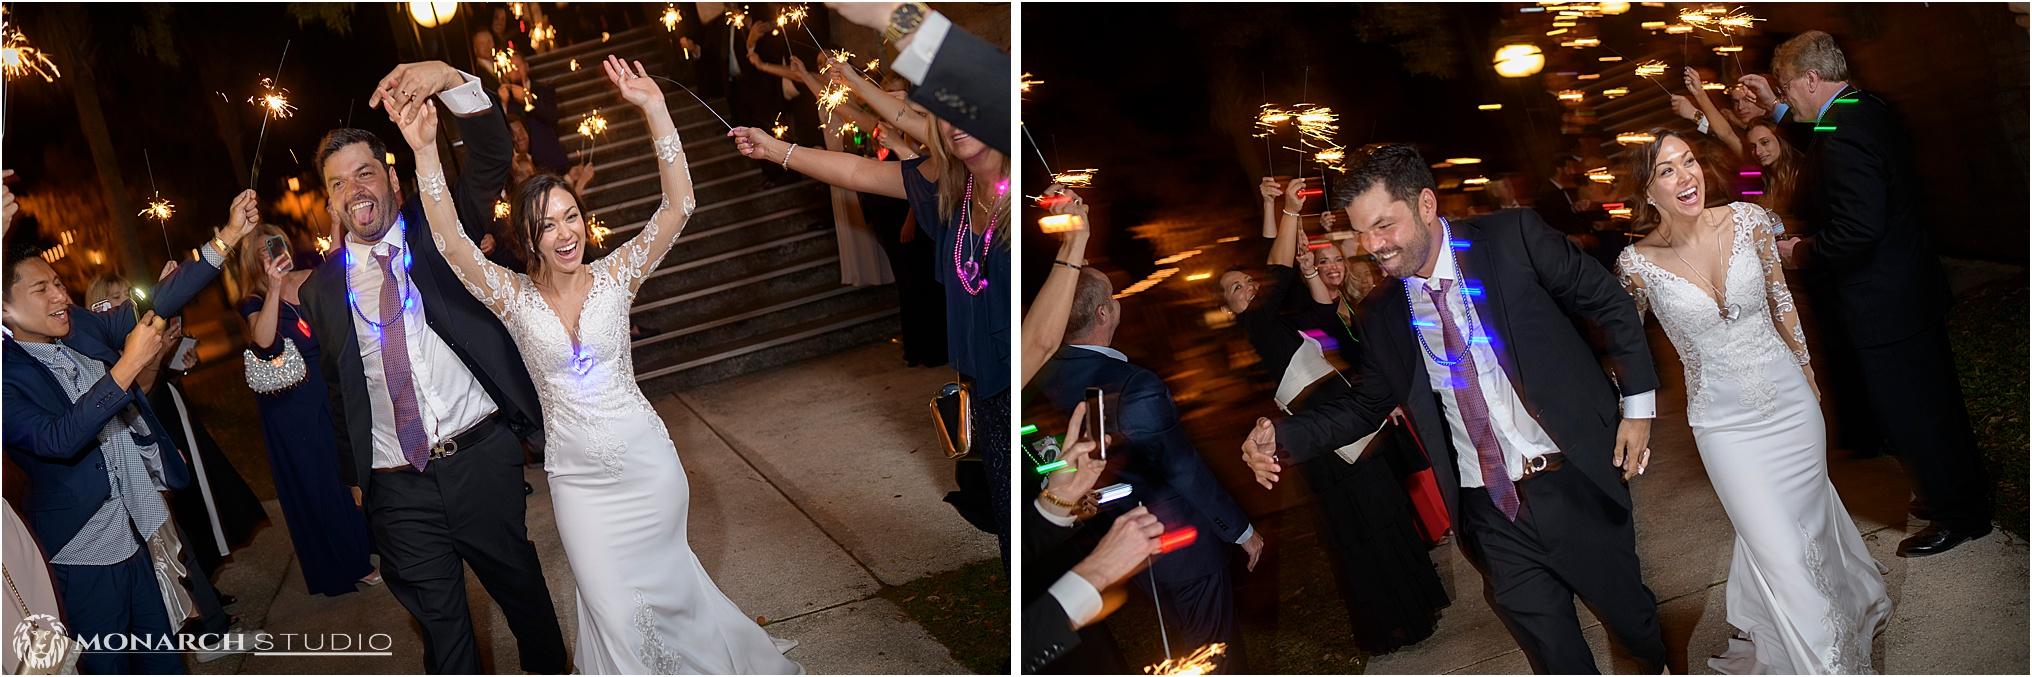 st-augustine-high-end-wedding-photographers-165.jpg